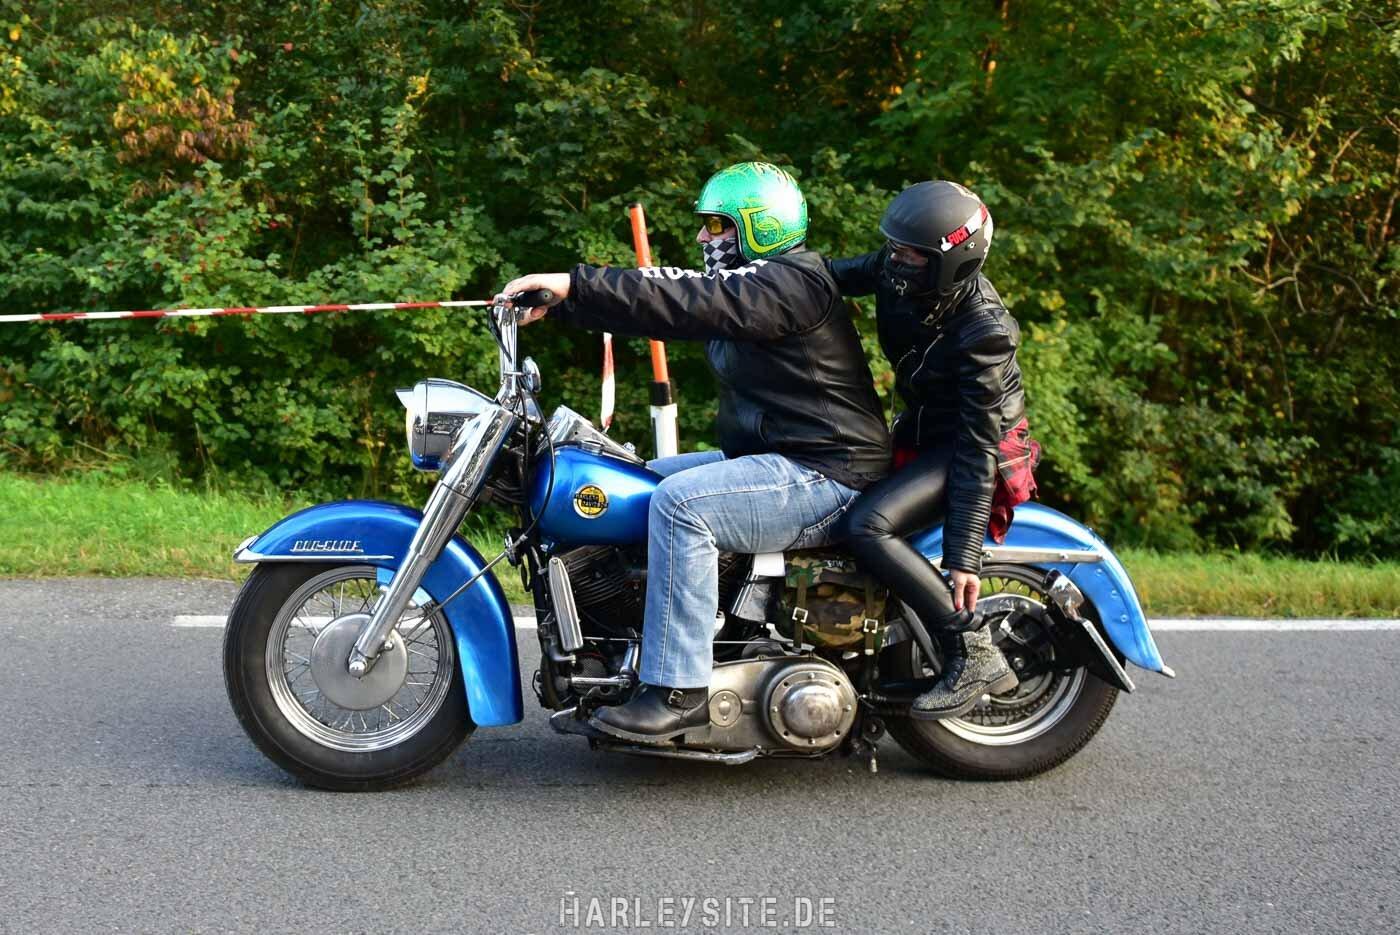 European-Bike-Week-9491